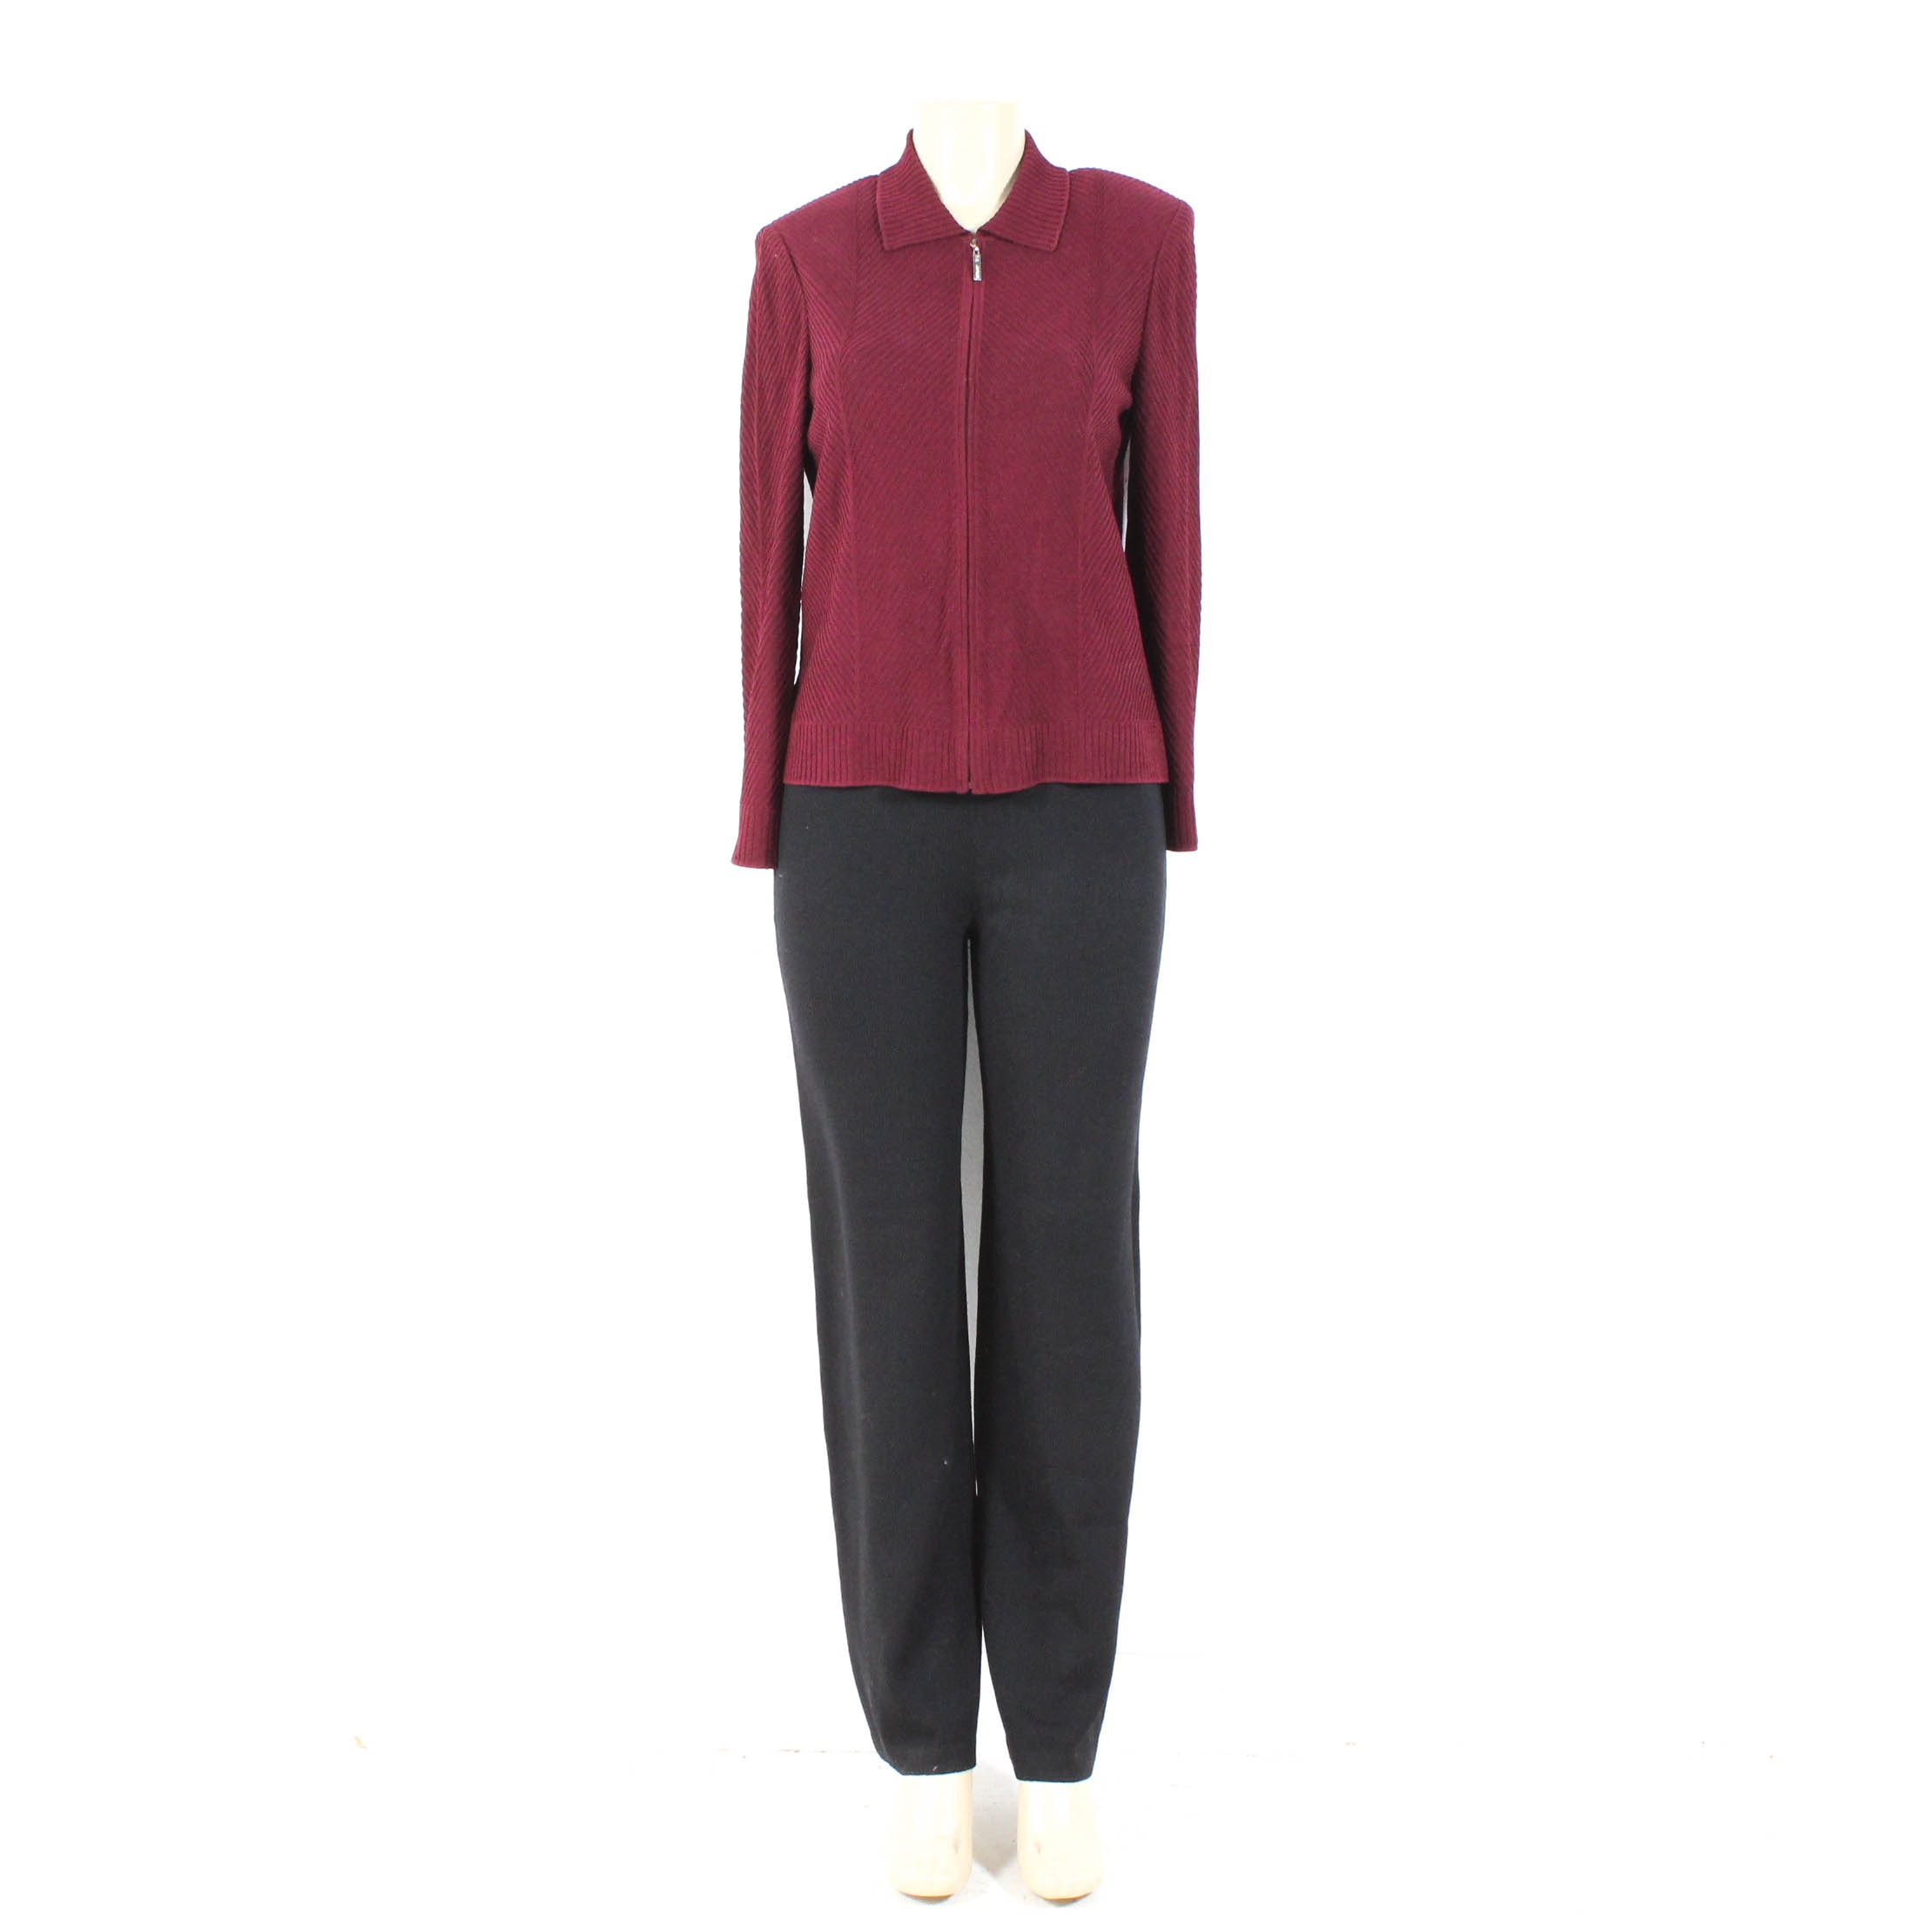 St. John Burgundy Knit Zipper-Front Sweater and St. John Caviar Black Knit Pants